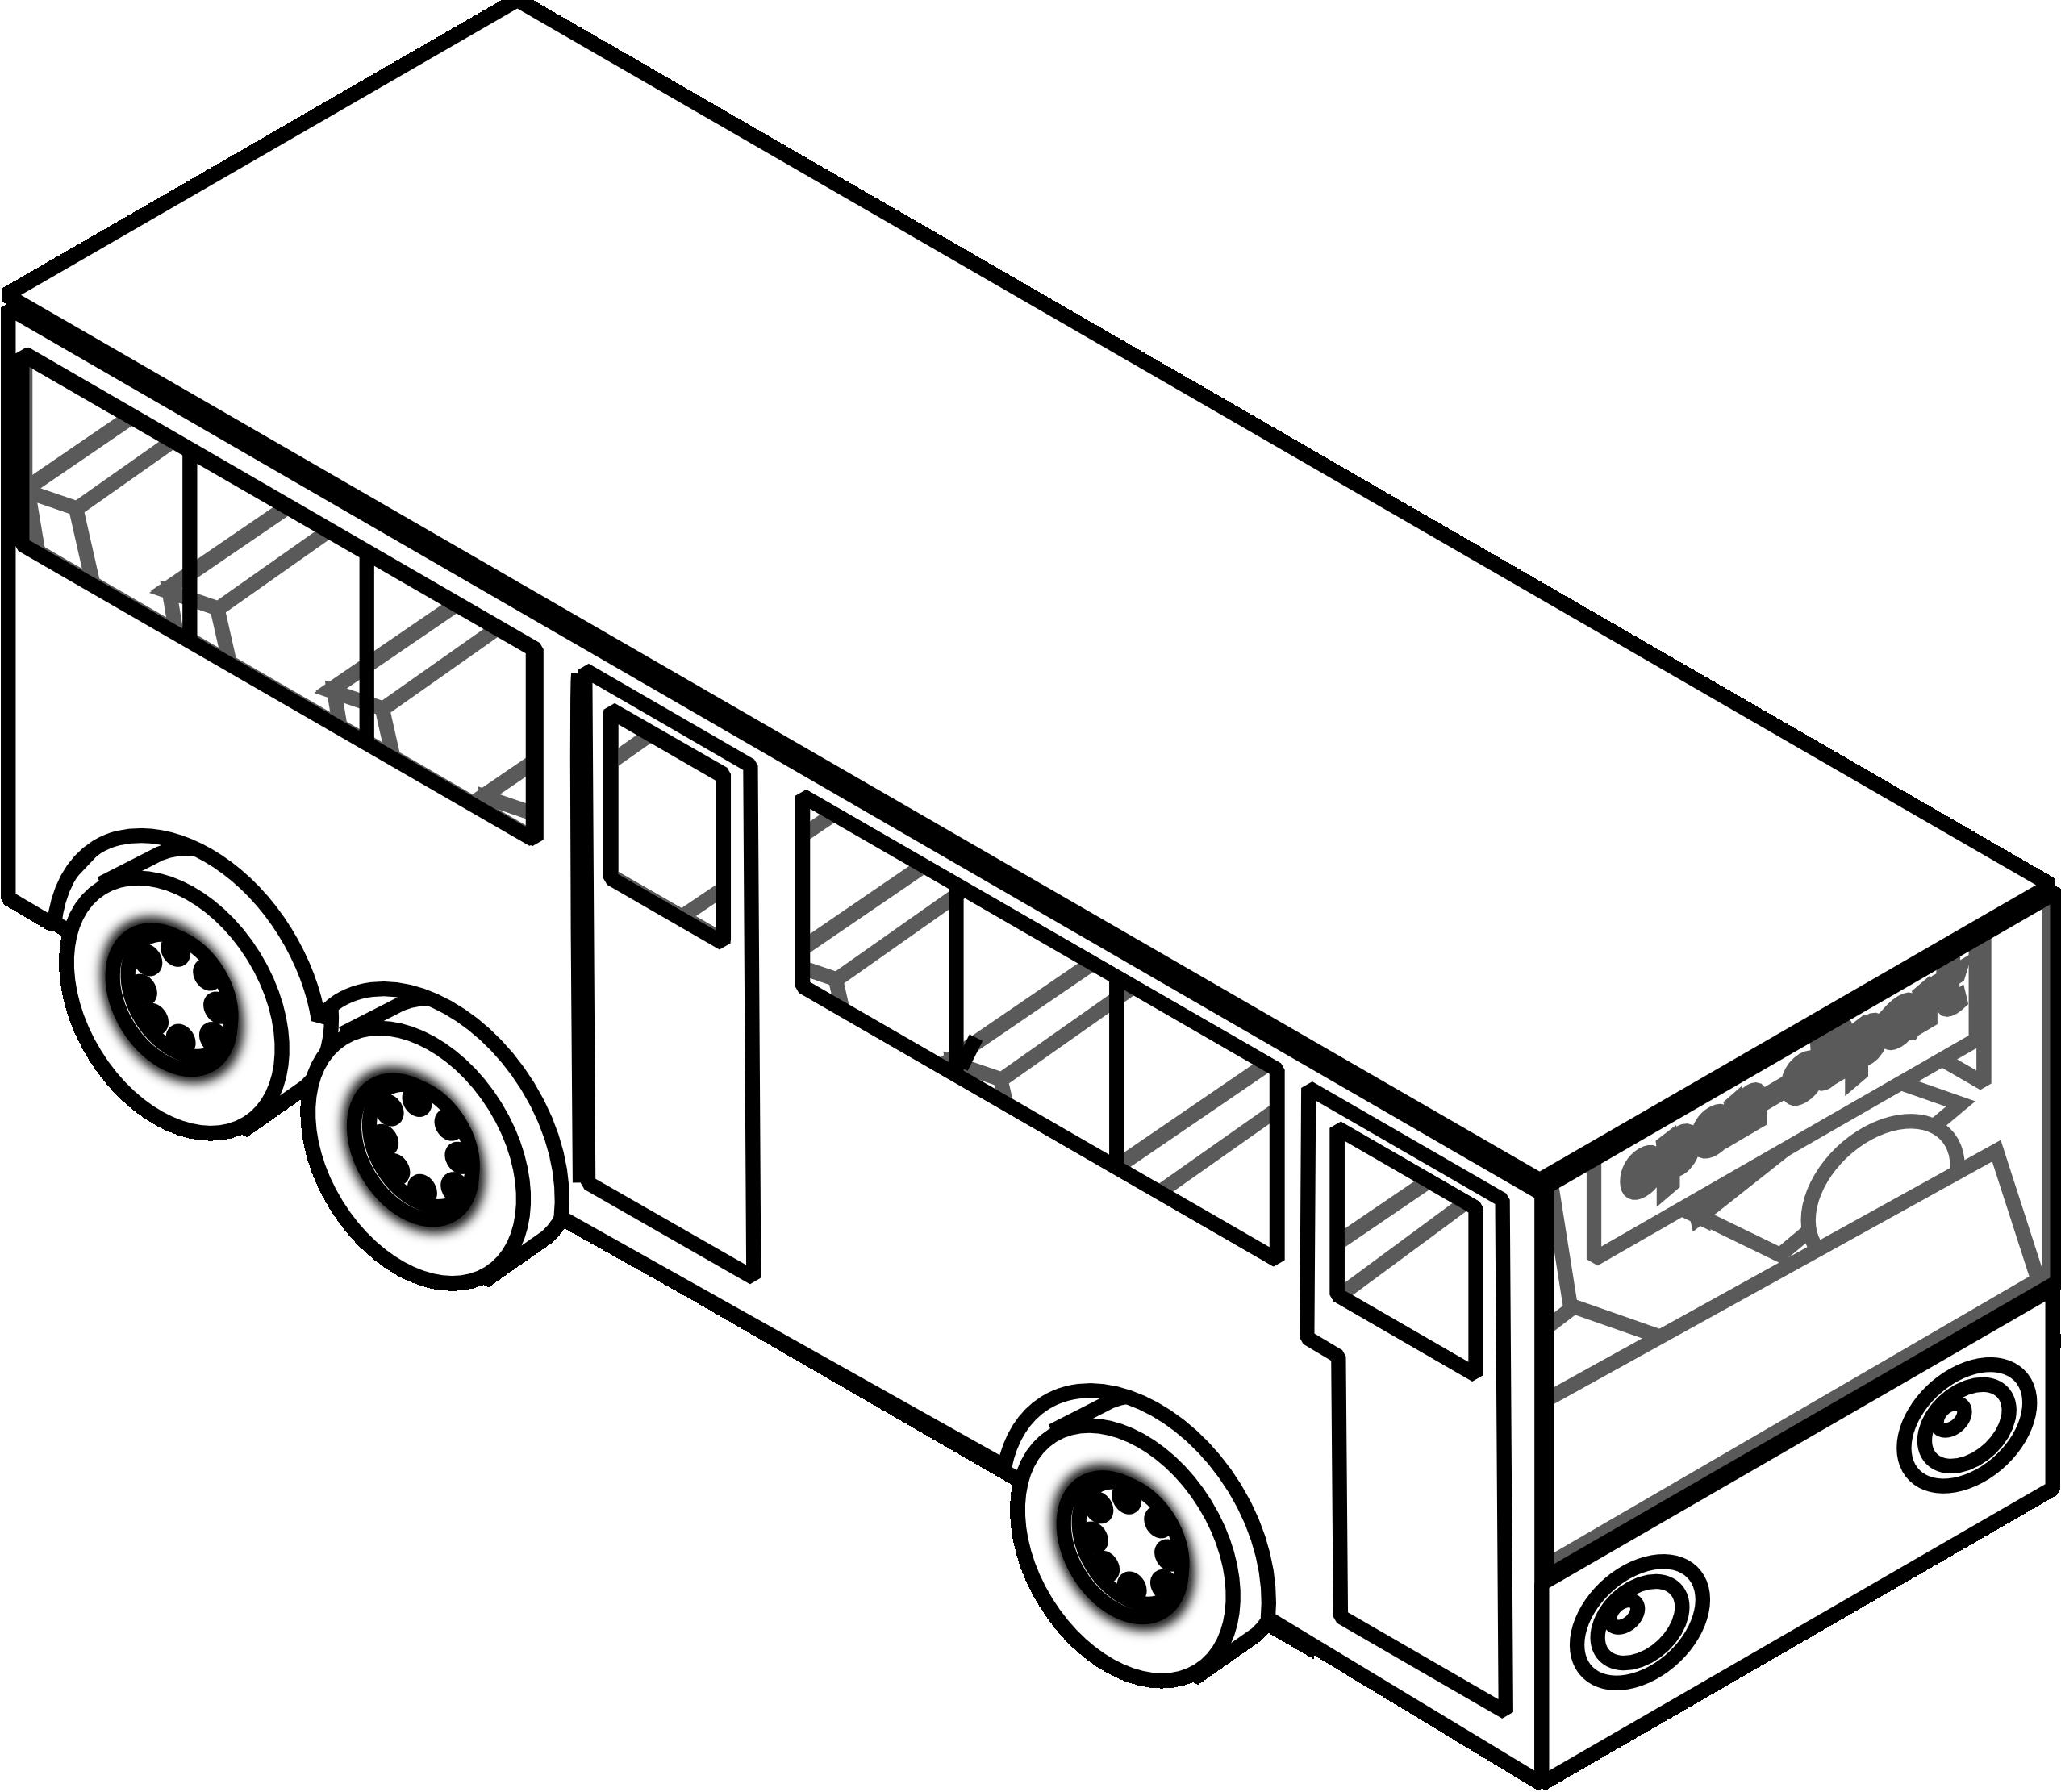 Clip Art Bus Clipart Black And White school bus black and white clipart kid panda free images